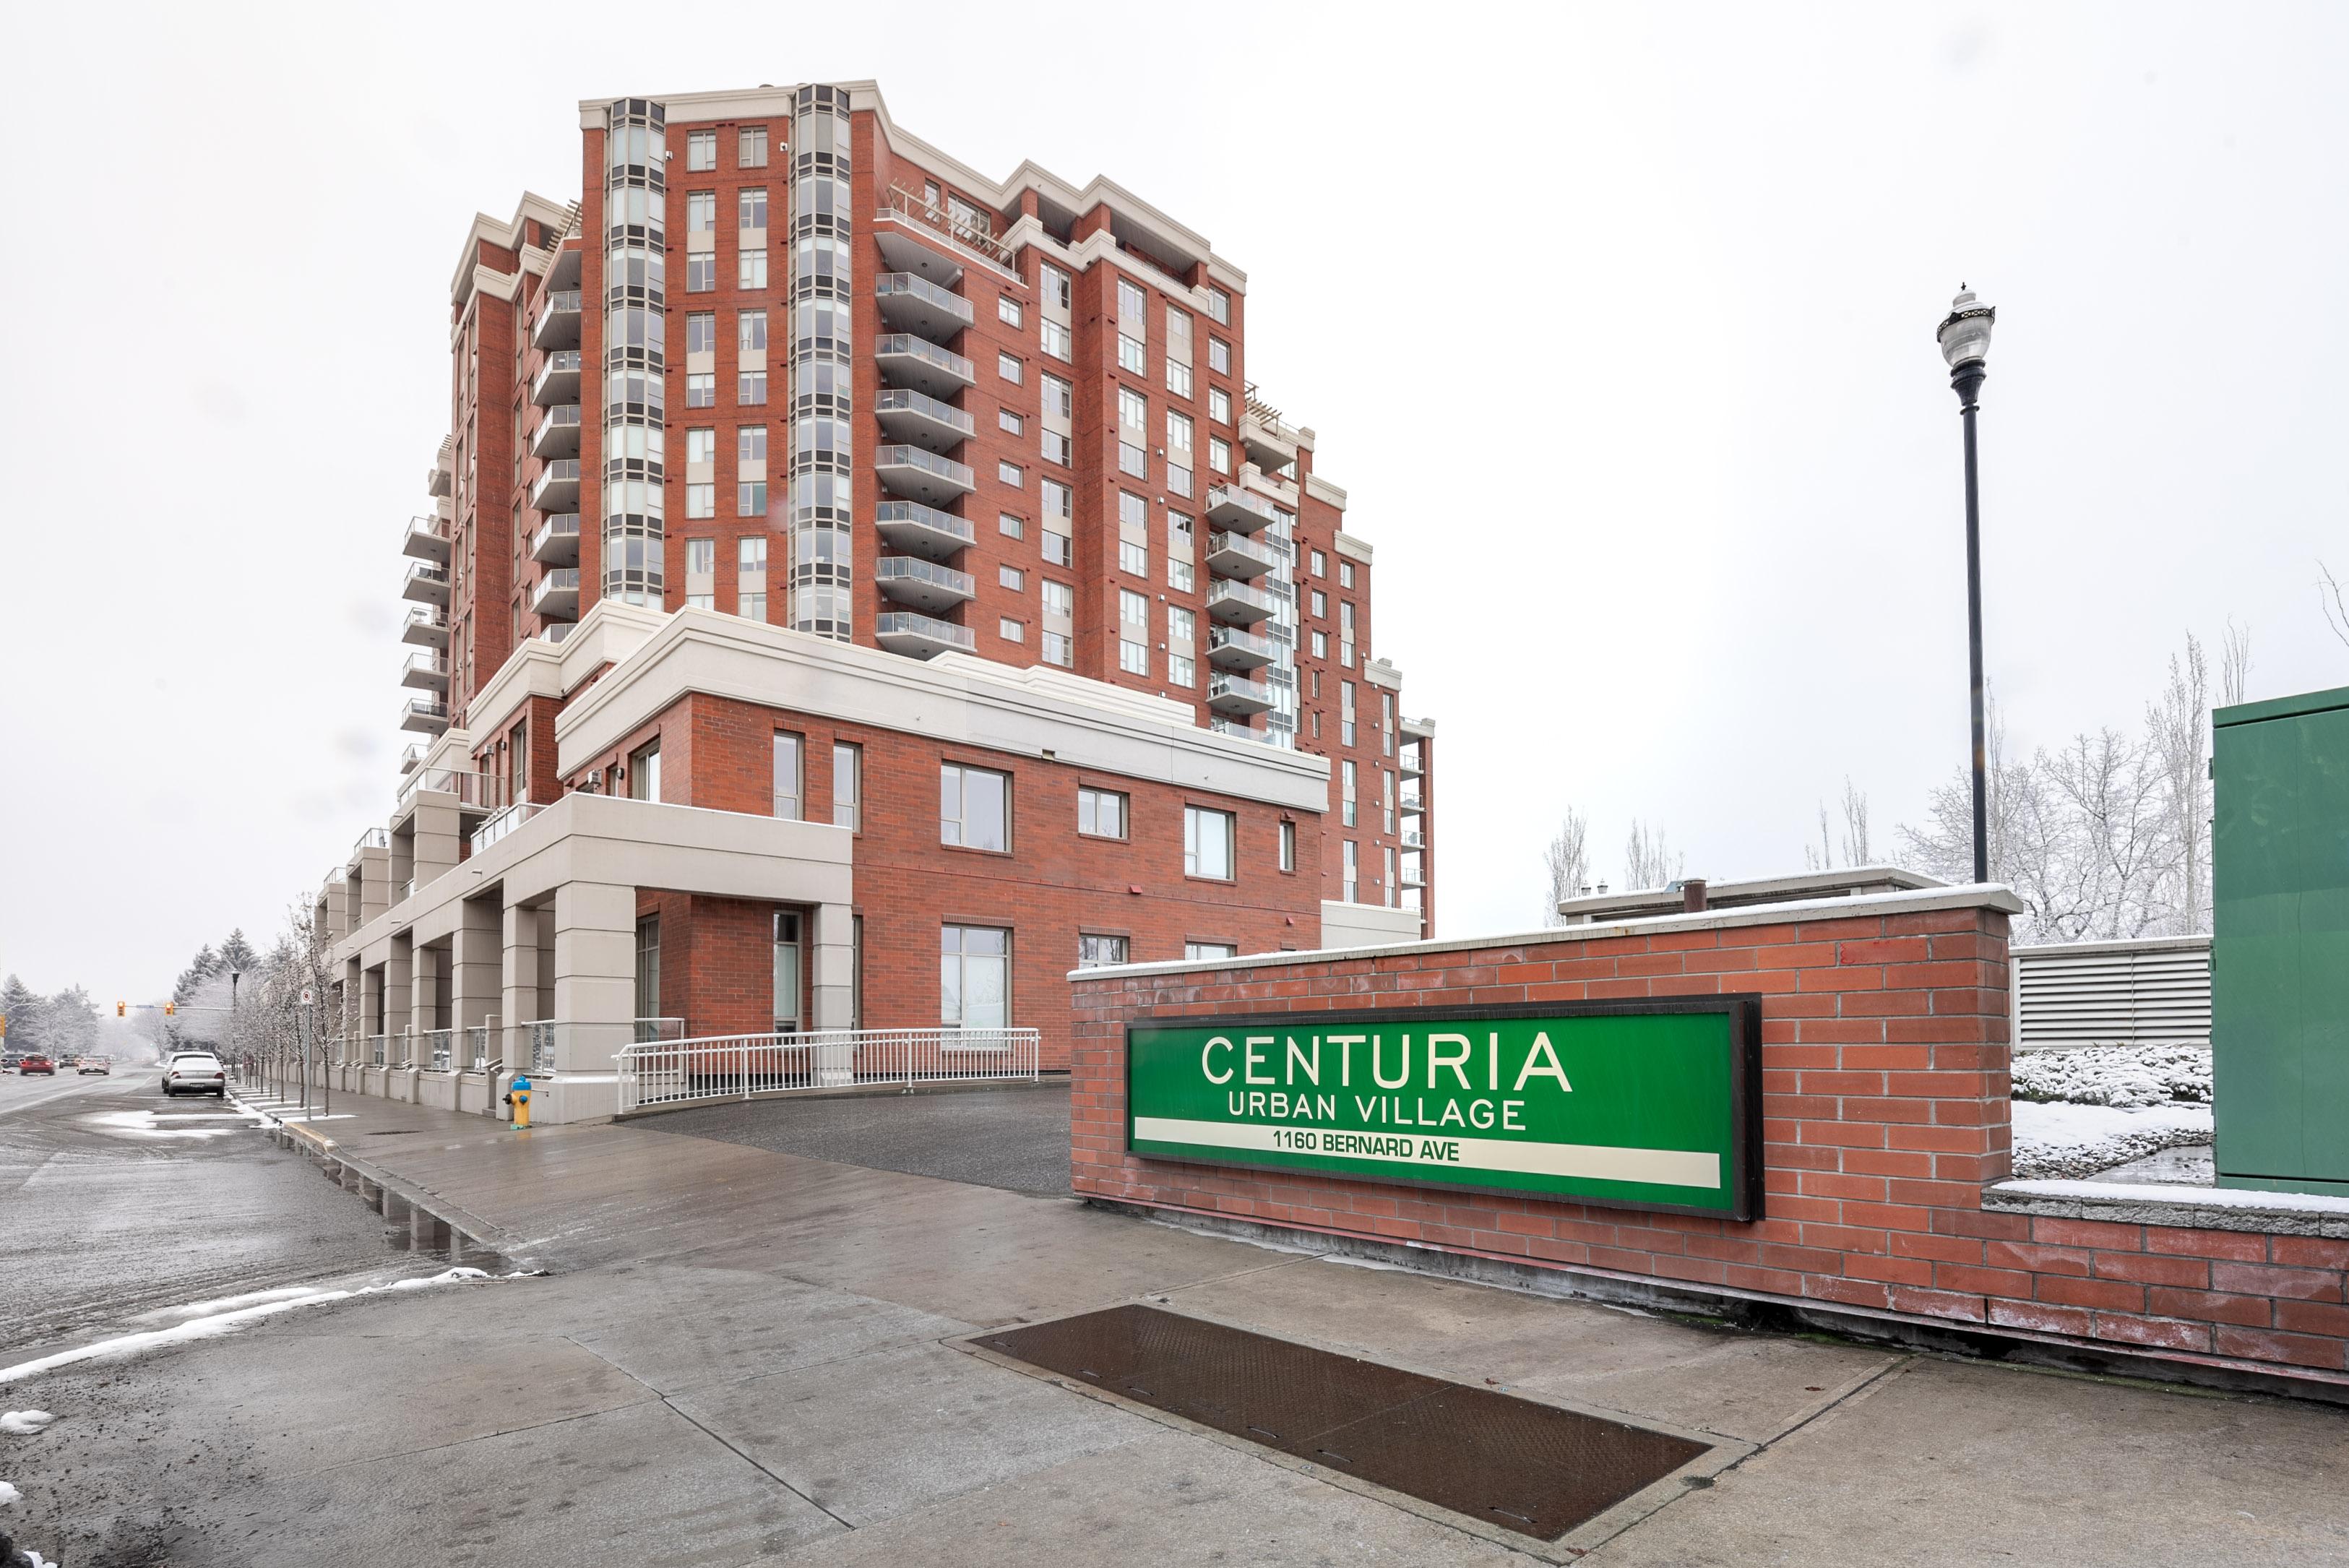 Centuria Urban Village Entrance